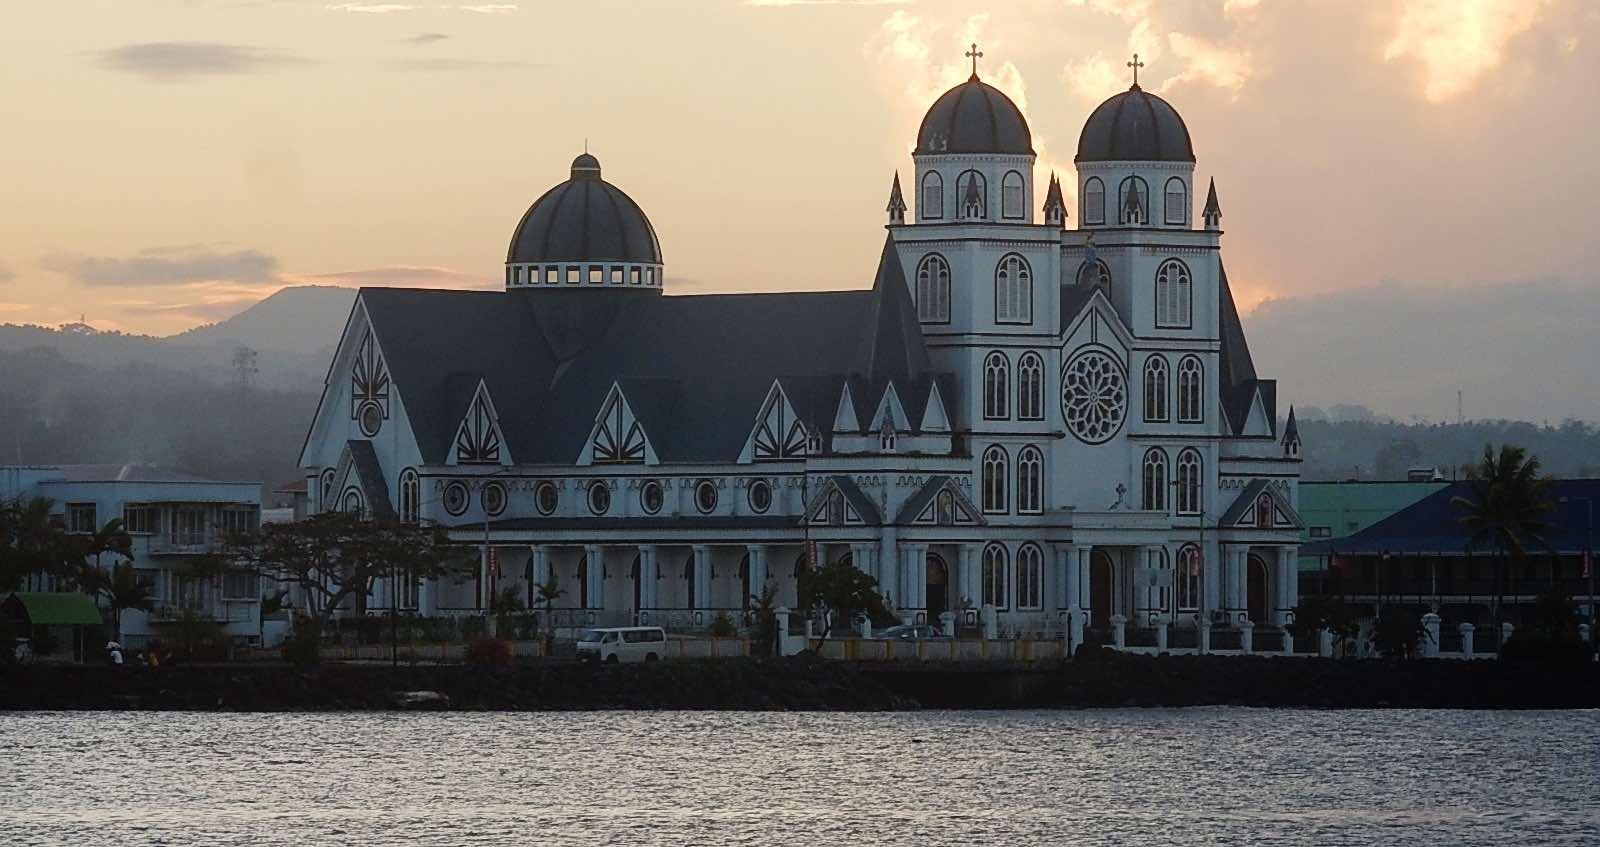 Apia, Samoa (Photo: Michael Coghlan/Flickr)